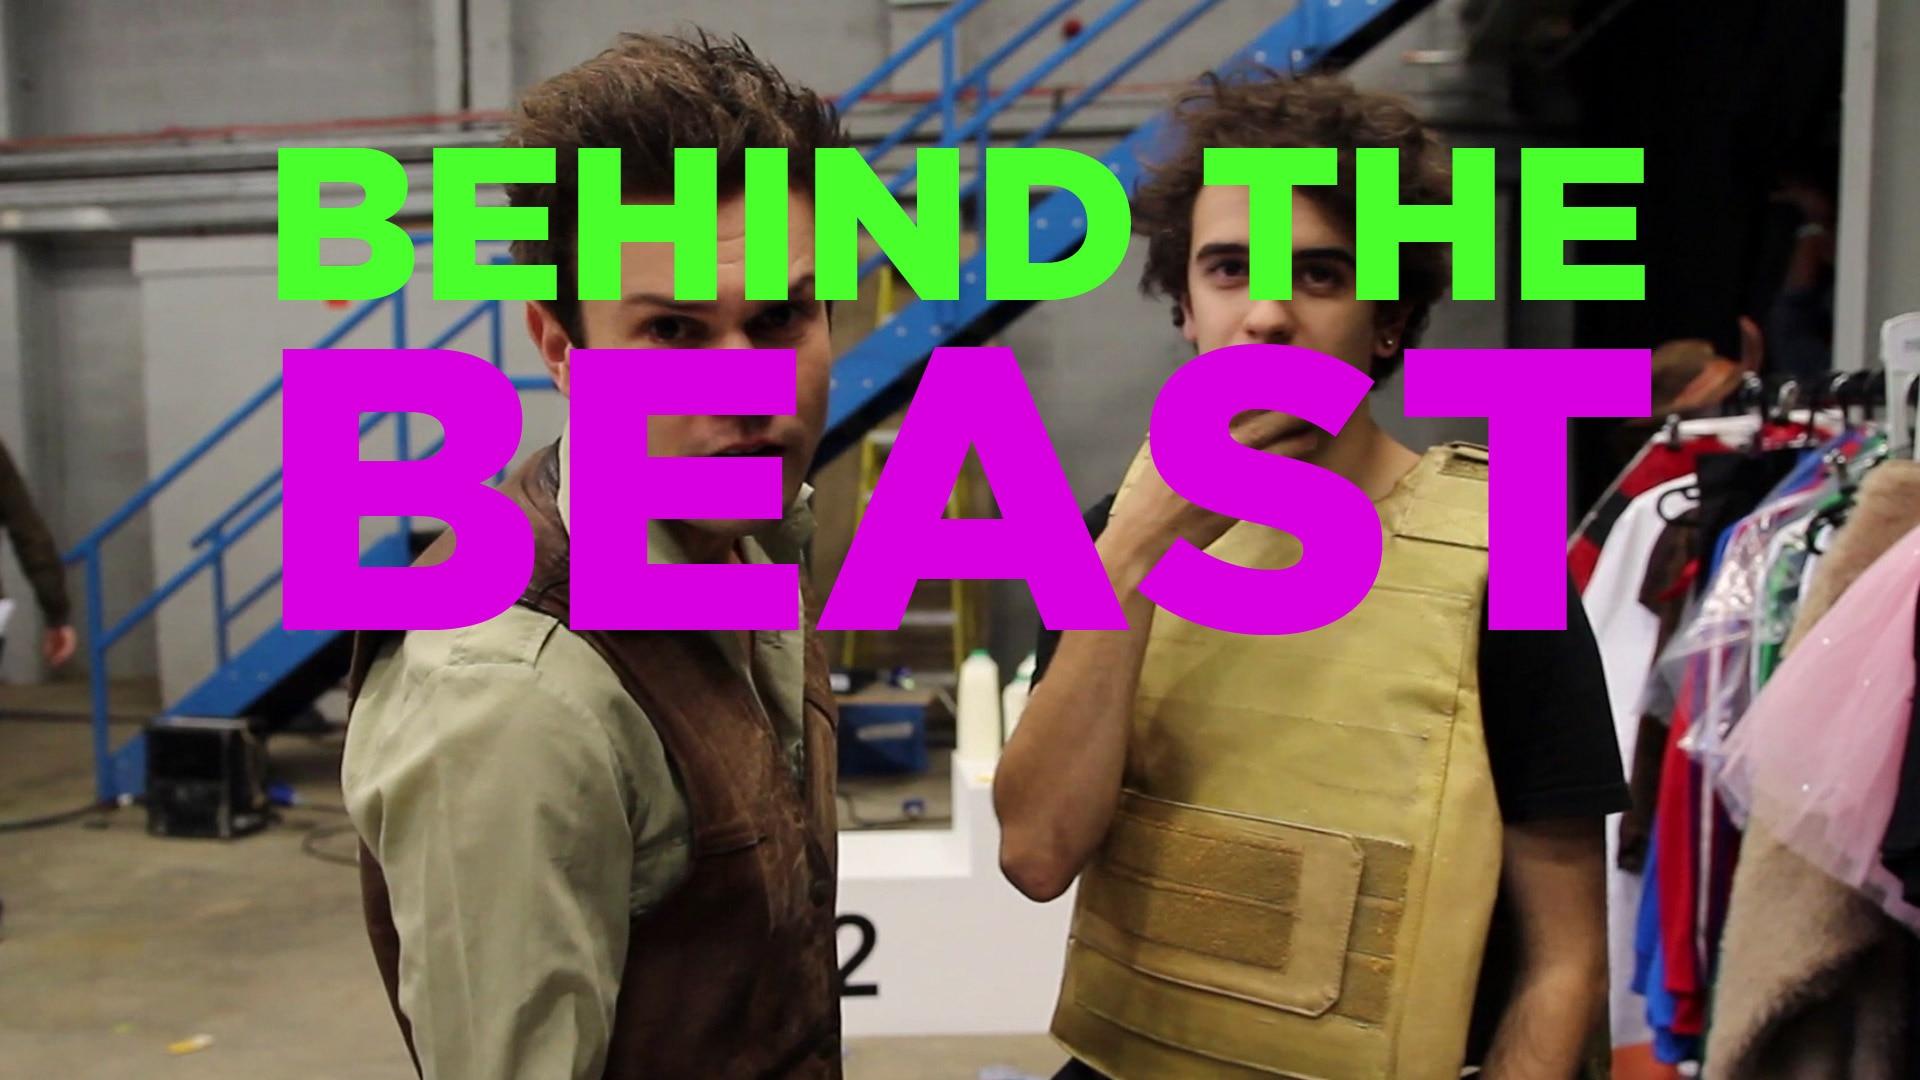 S2-Ep4: Behind the Scenes